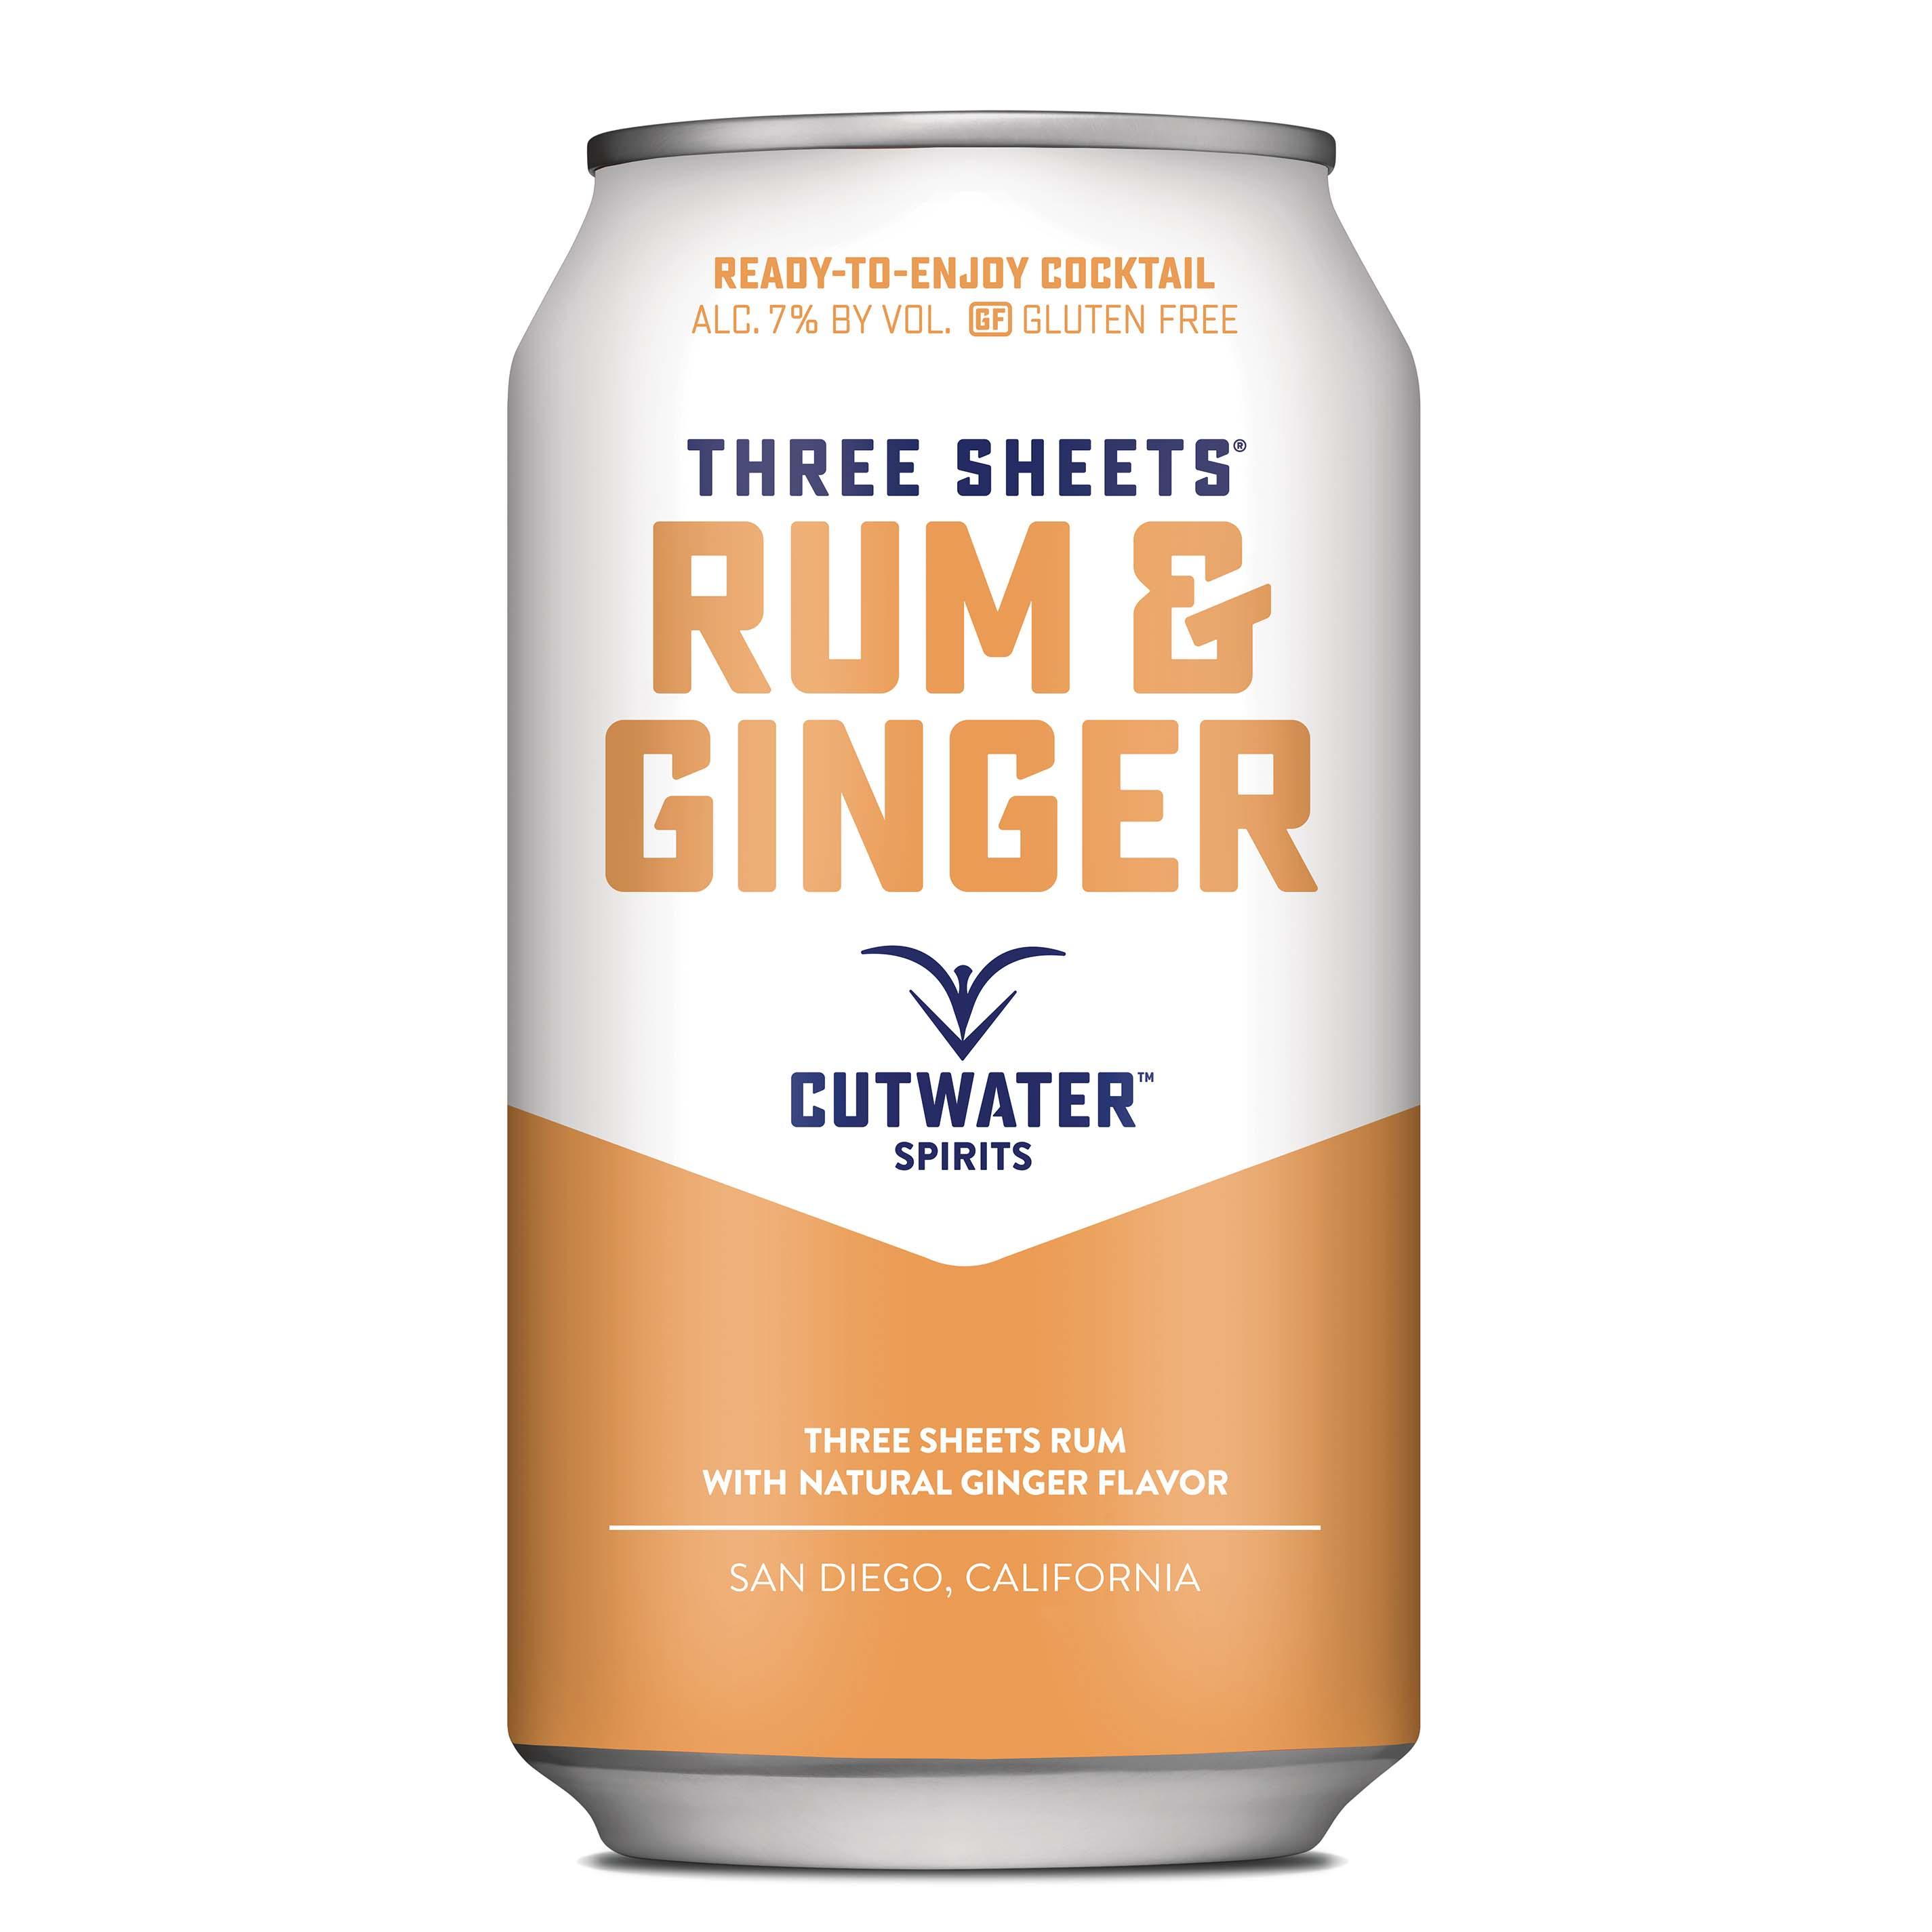 Cutwater, Rum & Ginger